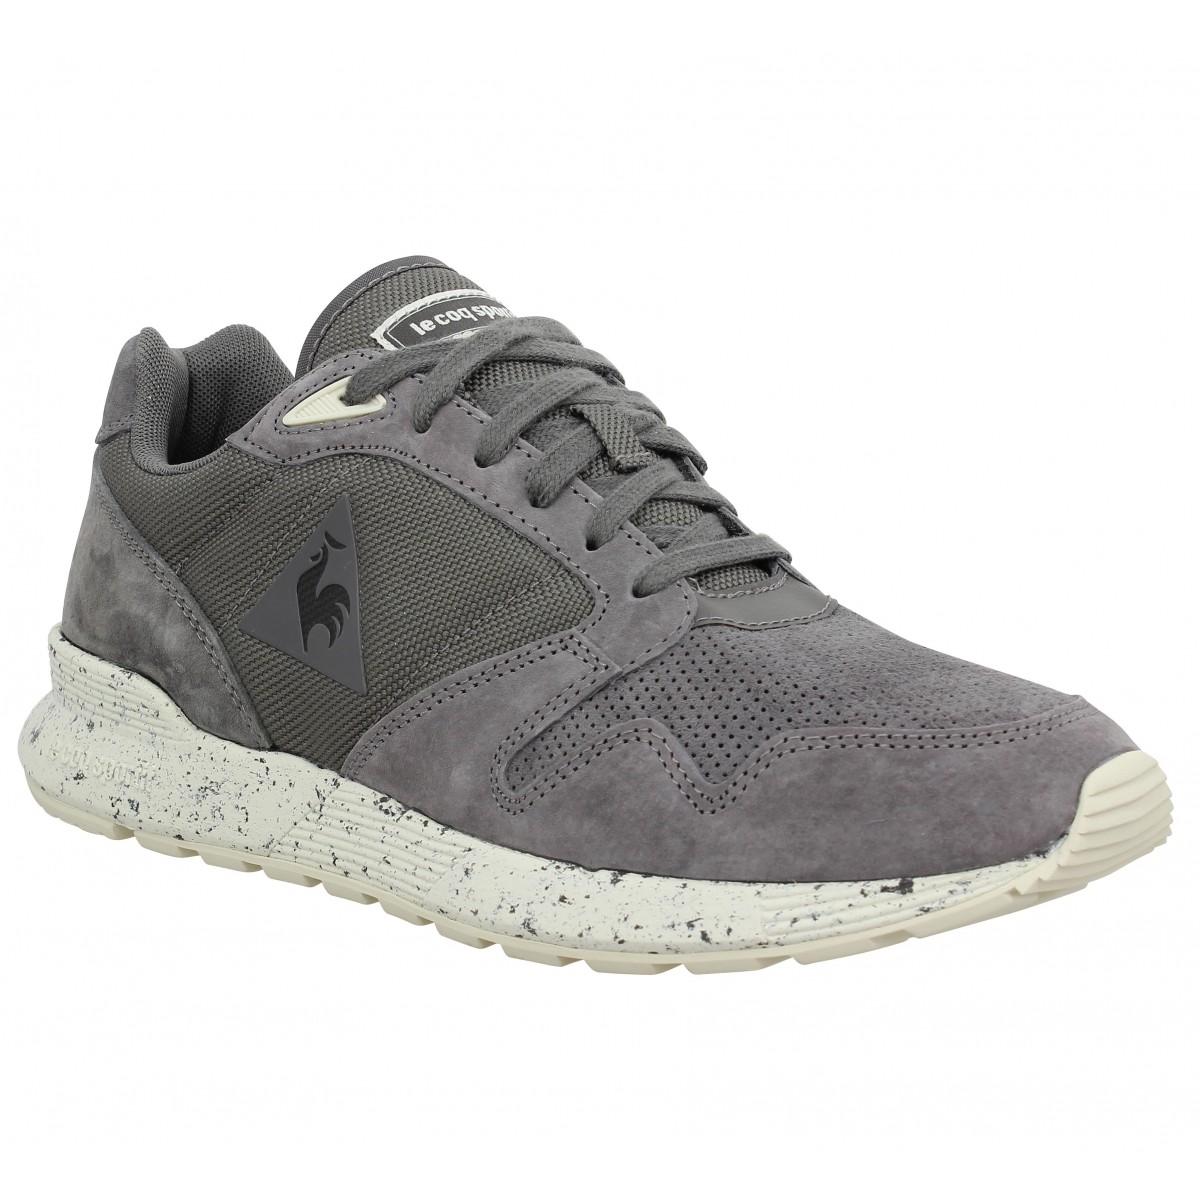 le coq sportif omega x premium velours homme gris homme fanny chaussures. Black Bedroom Furniture Sets. Home Design Ideas